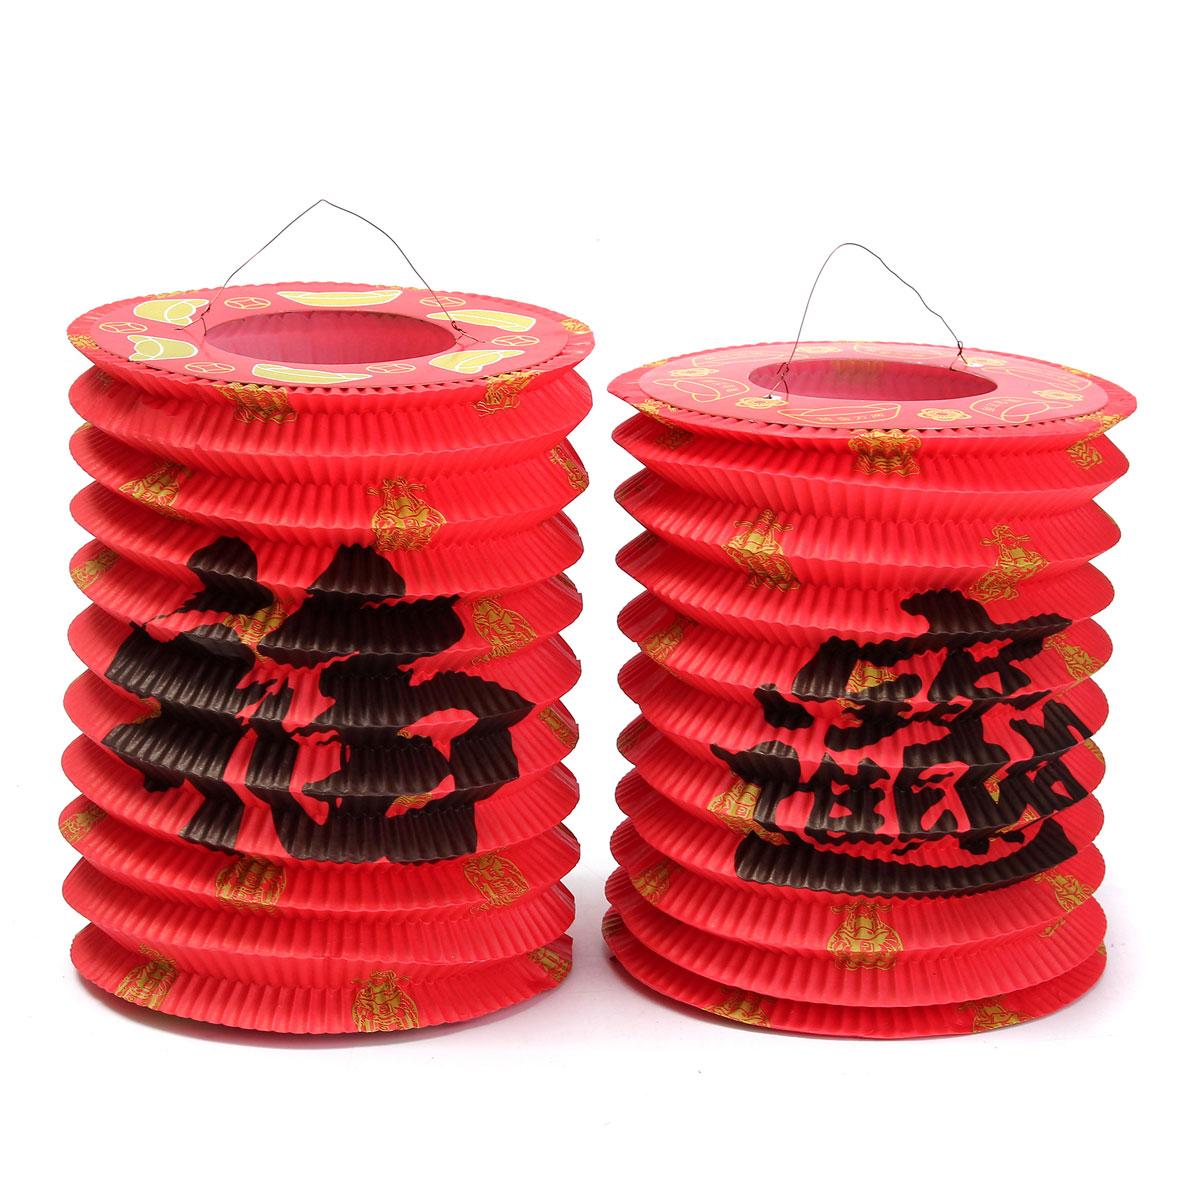 High Popular 1pcs 16 40cm Traditional Chinese Paper Lanterns For Wedding Party Pendant Lights Lanterns Sturdy Construction Lights & Lighting